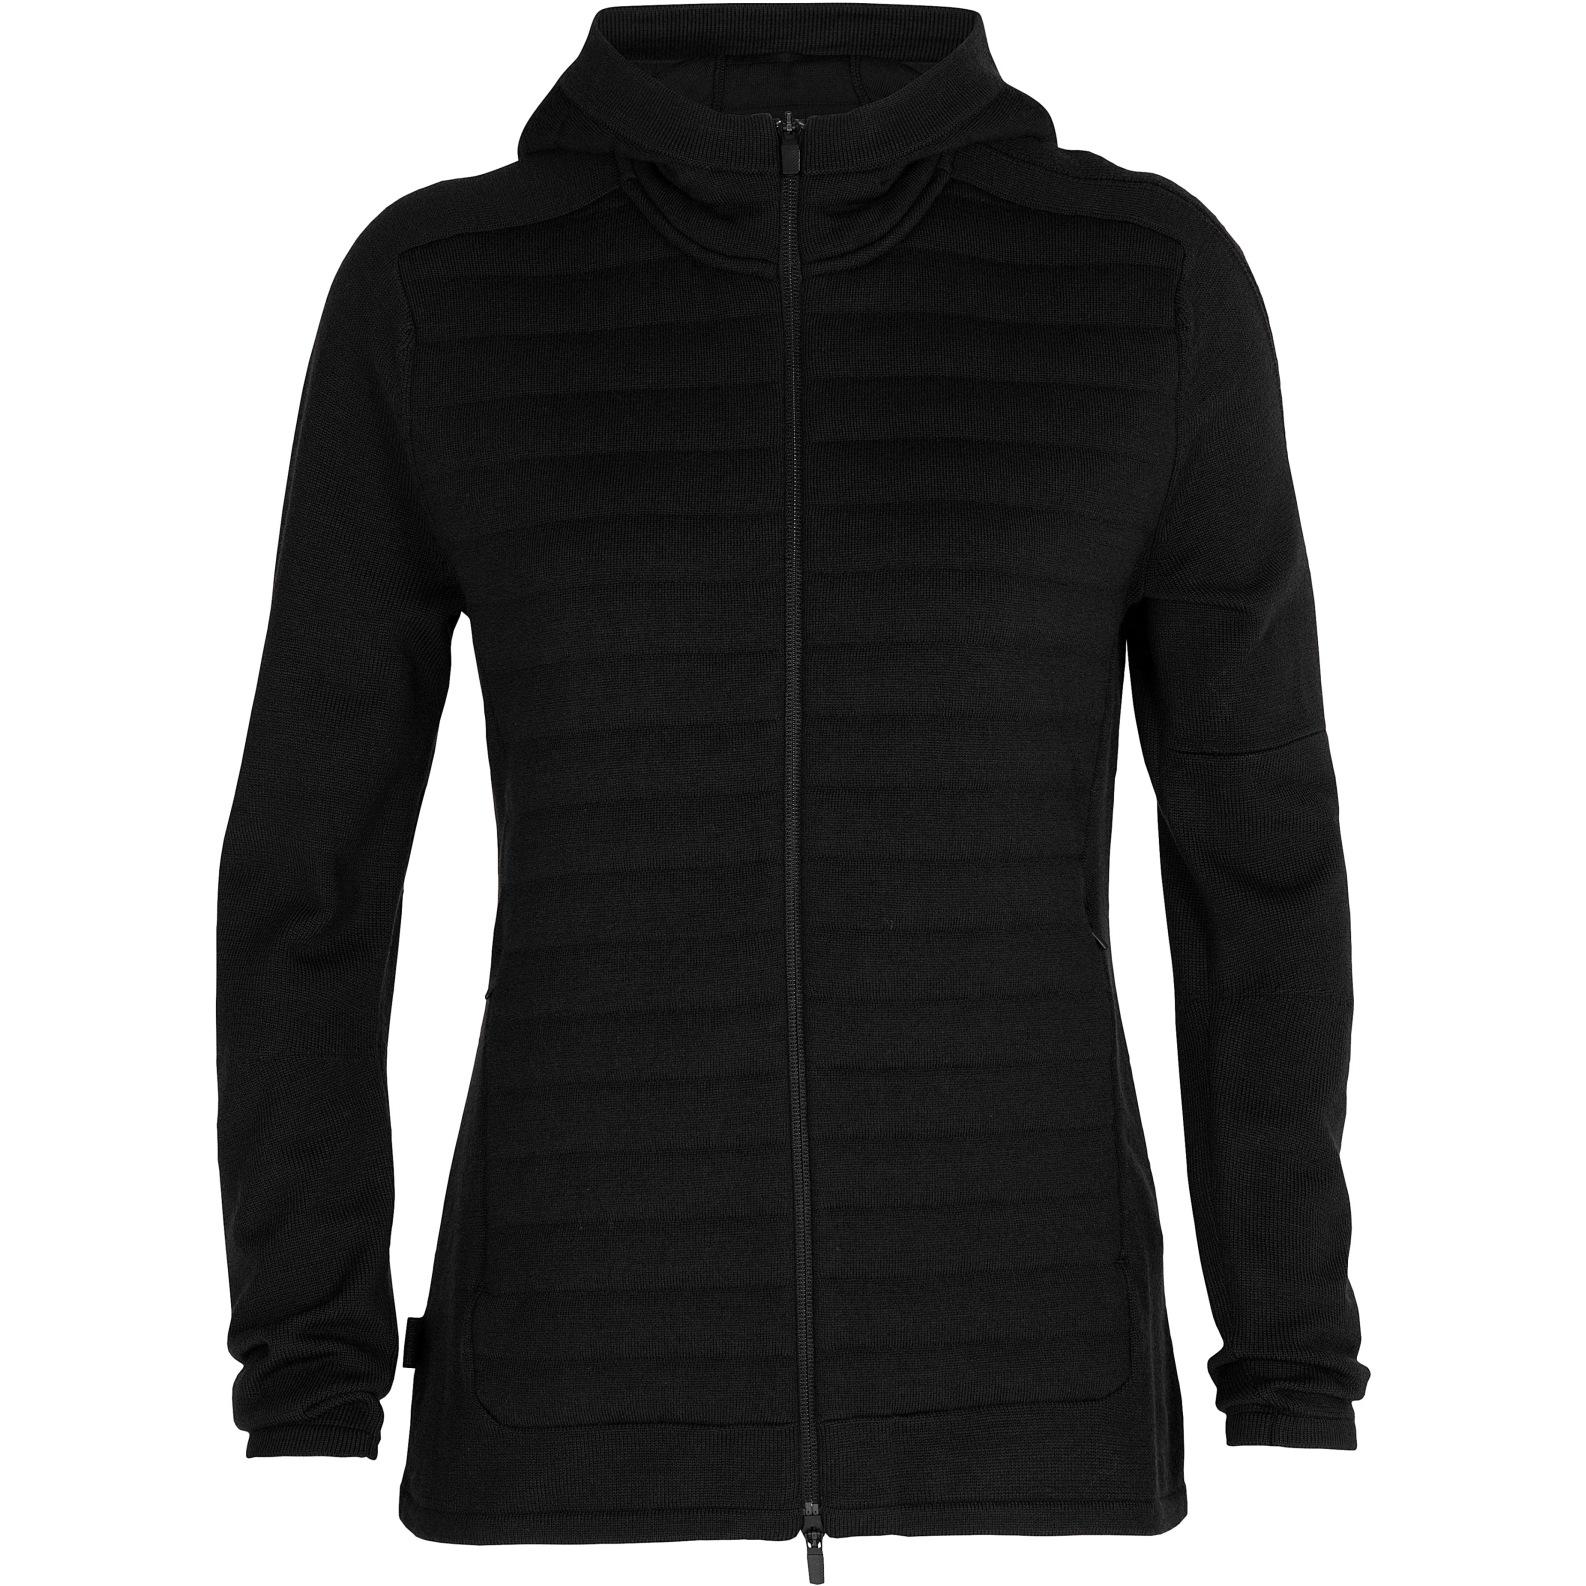 Produktbild von Icebreaker ZoneKnit™ Insulated Zip Hoodie Damen Kapuzenjacke - Black